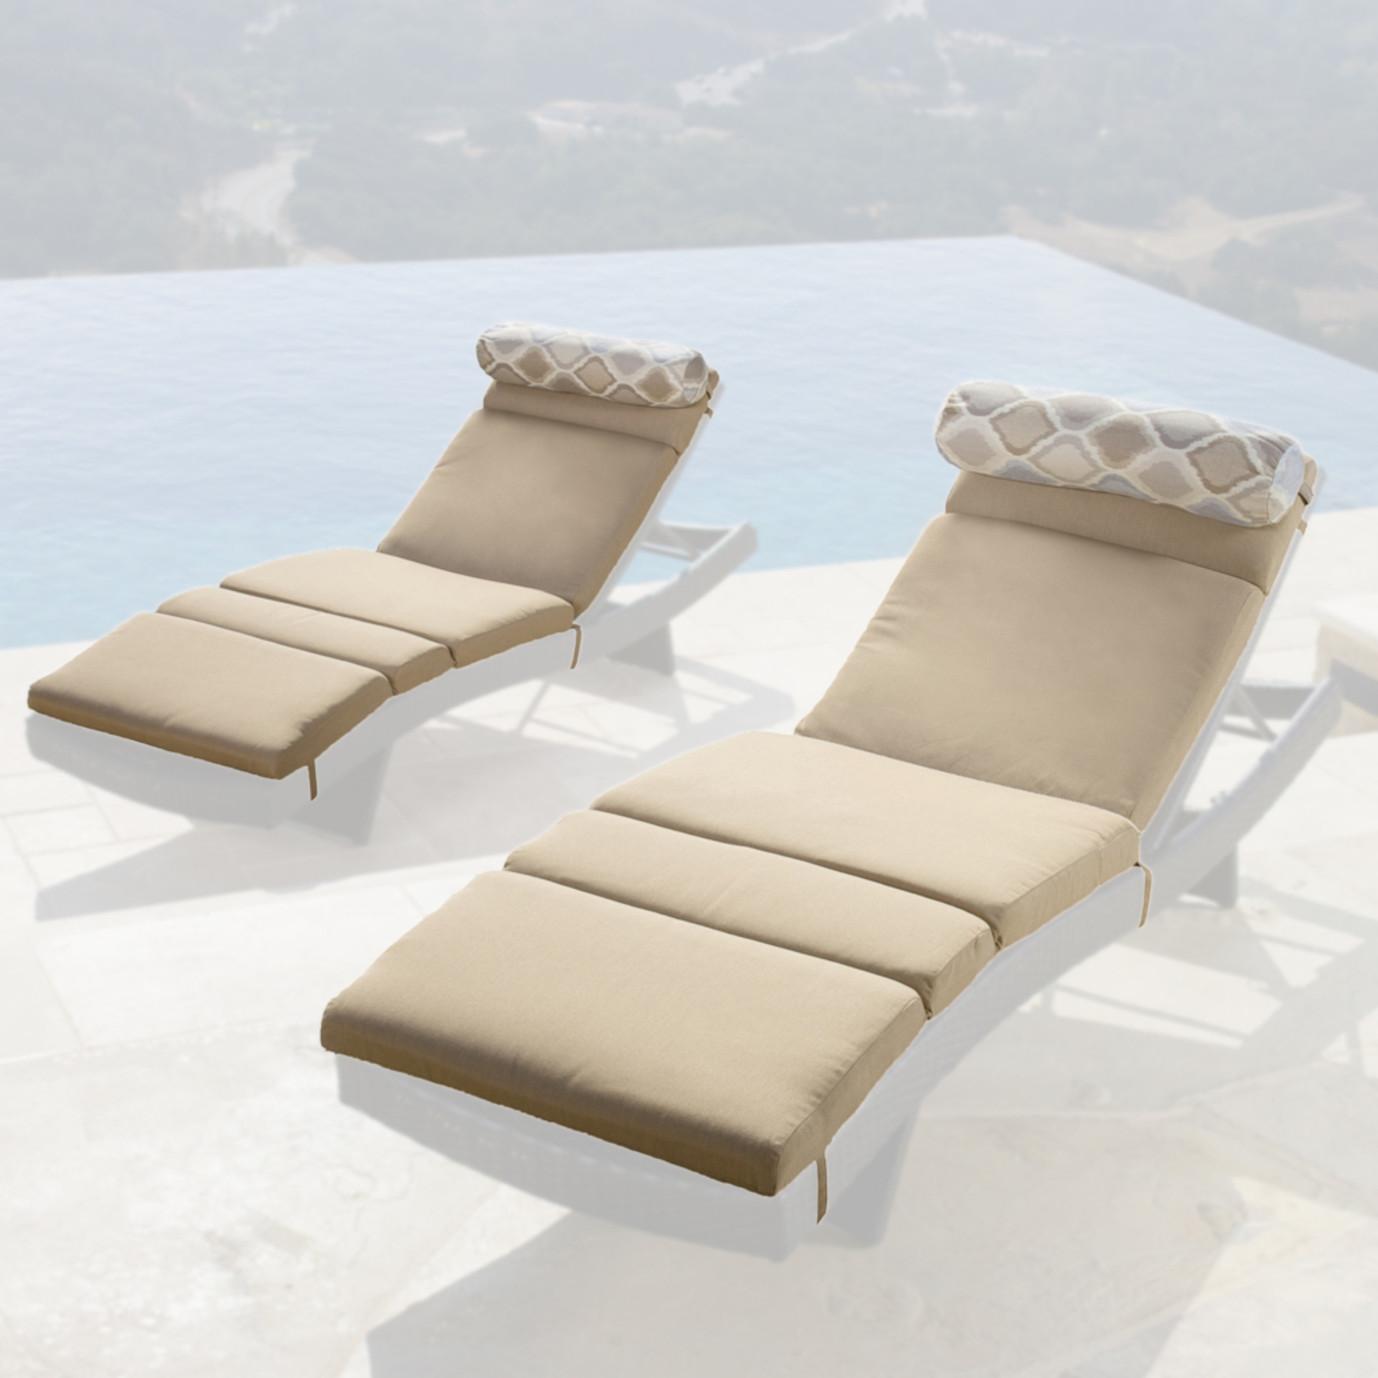 Portofino™ Comfort 2pk Lounger Cushions - Heather Beige